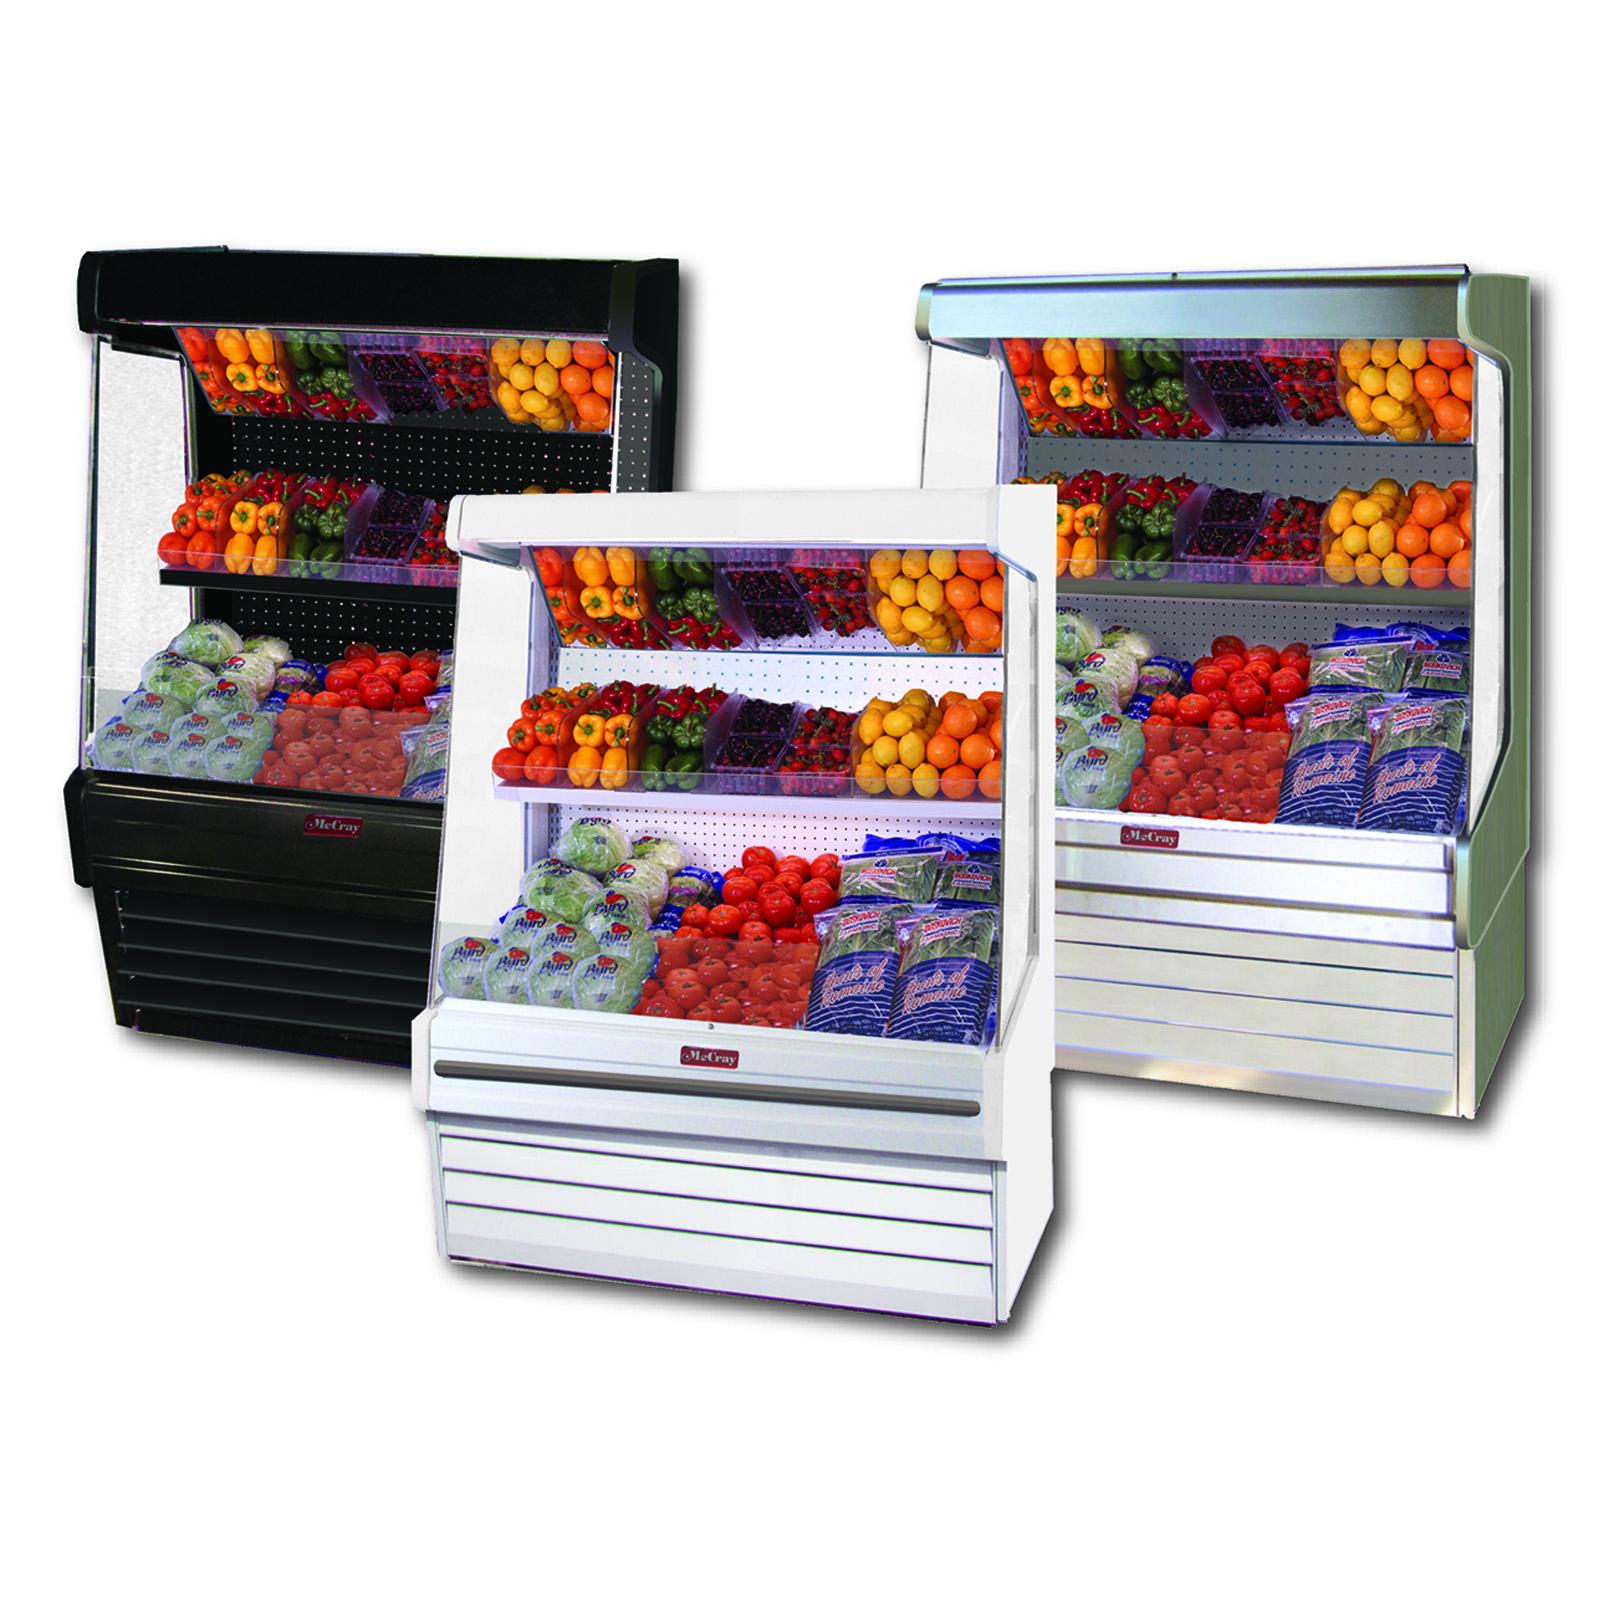 Howard-McCray SC-OP30E-3-B-LED display case, produce